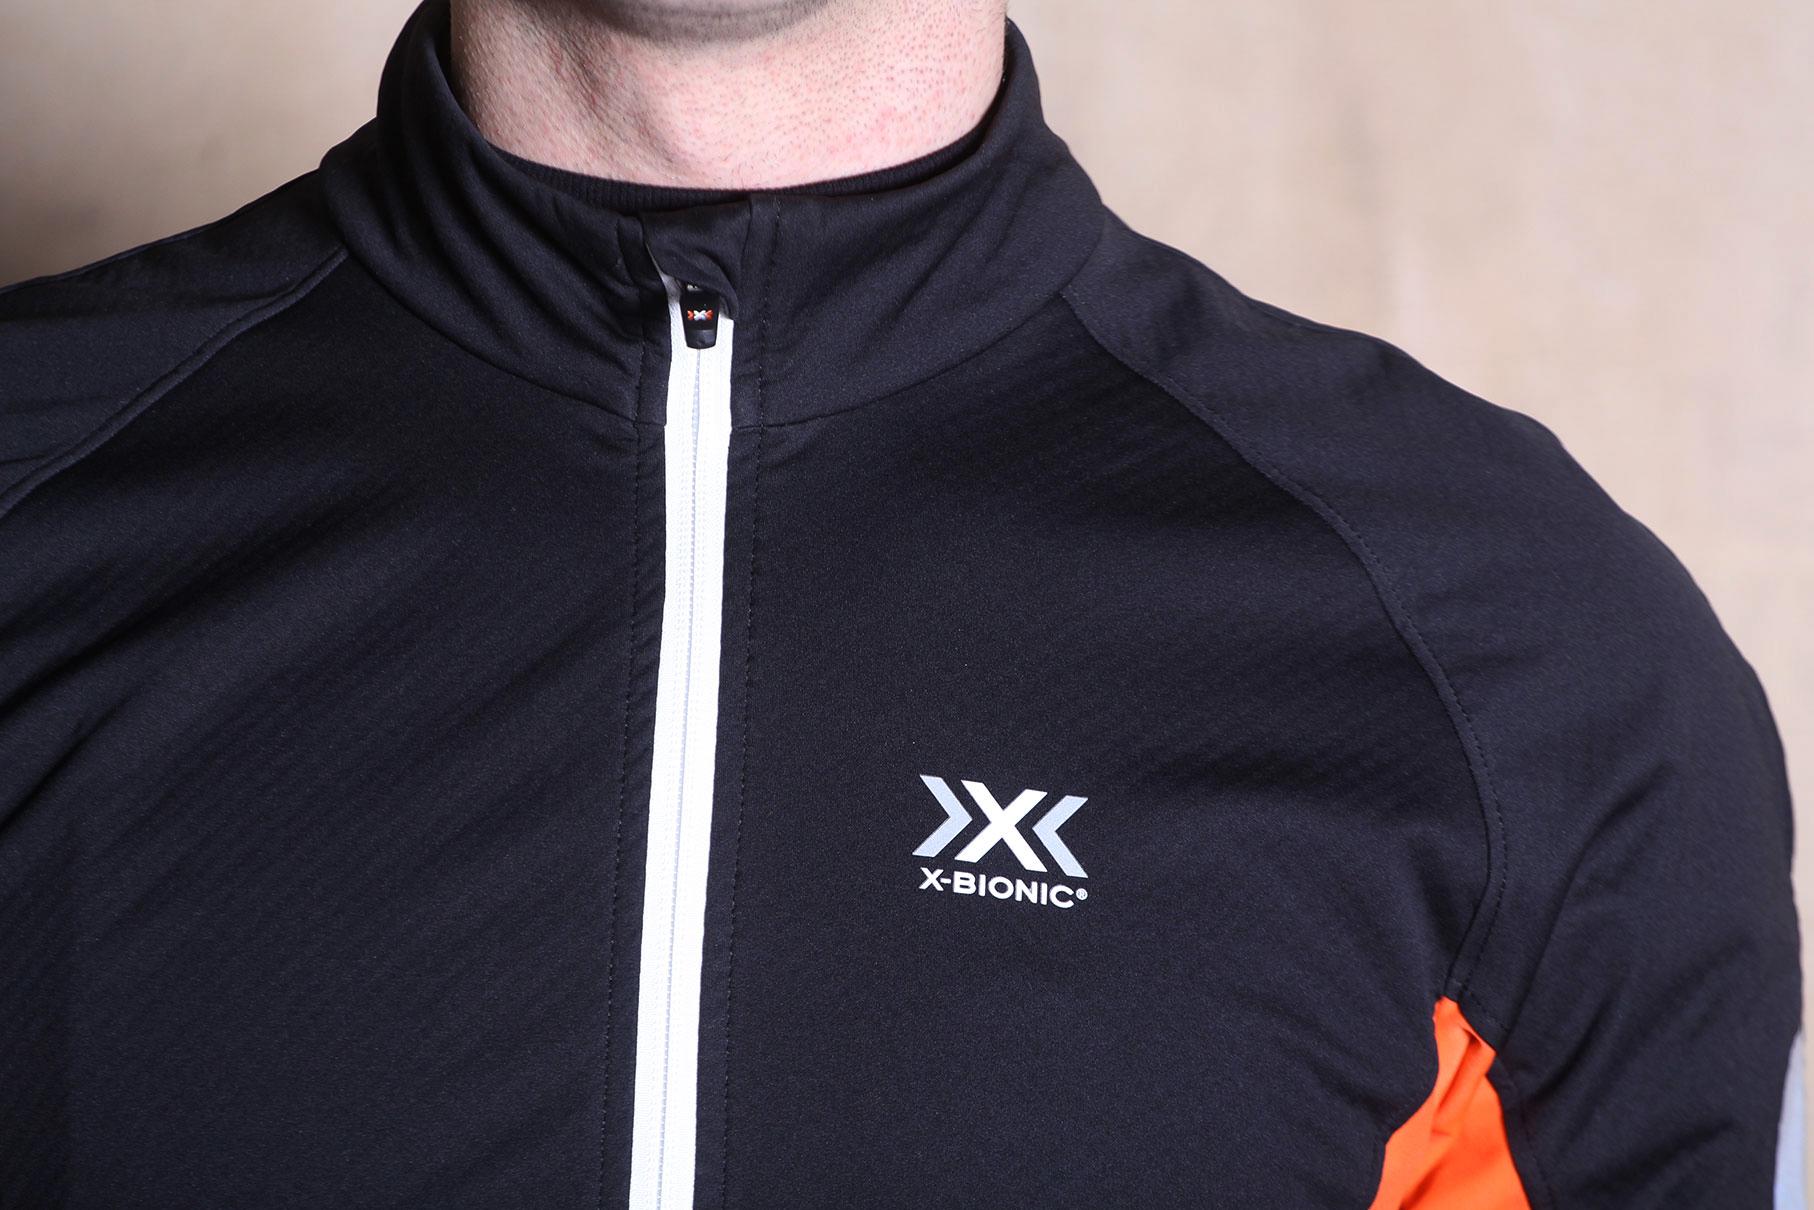 X-Bionic Cross Country Winter SphereWind Light Windproof Jacket